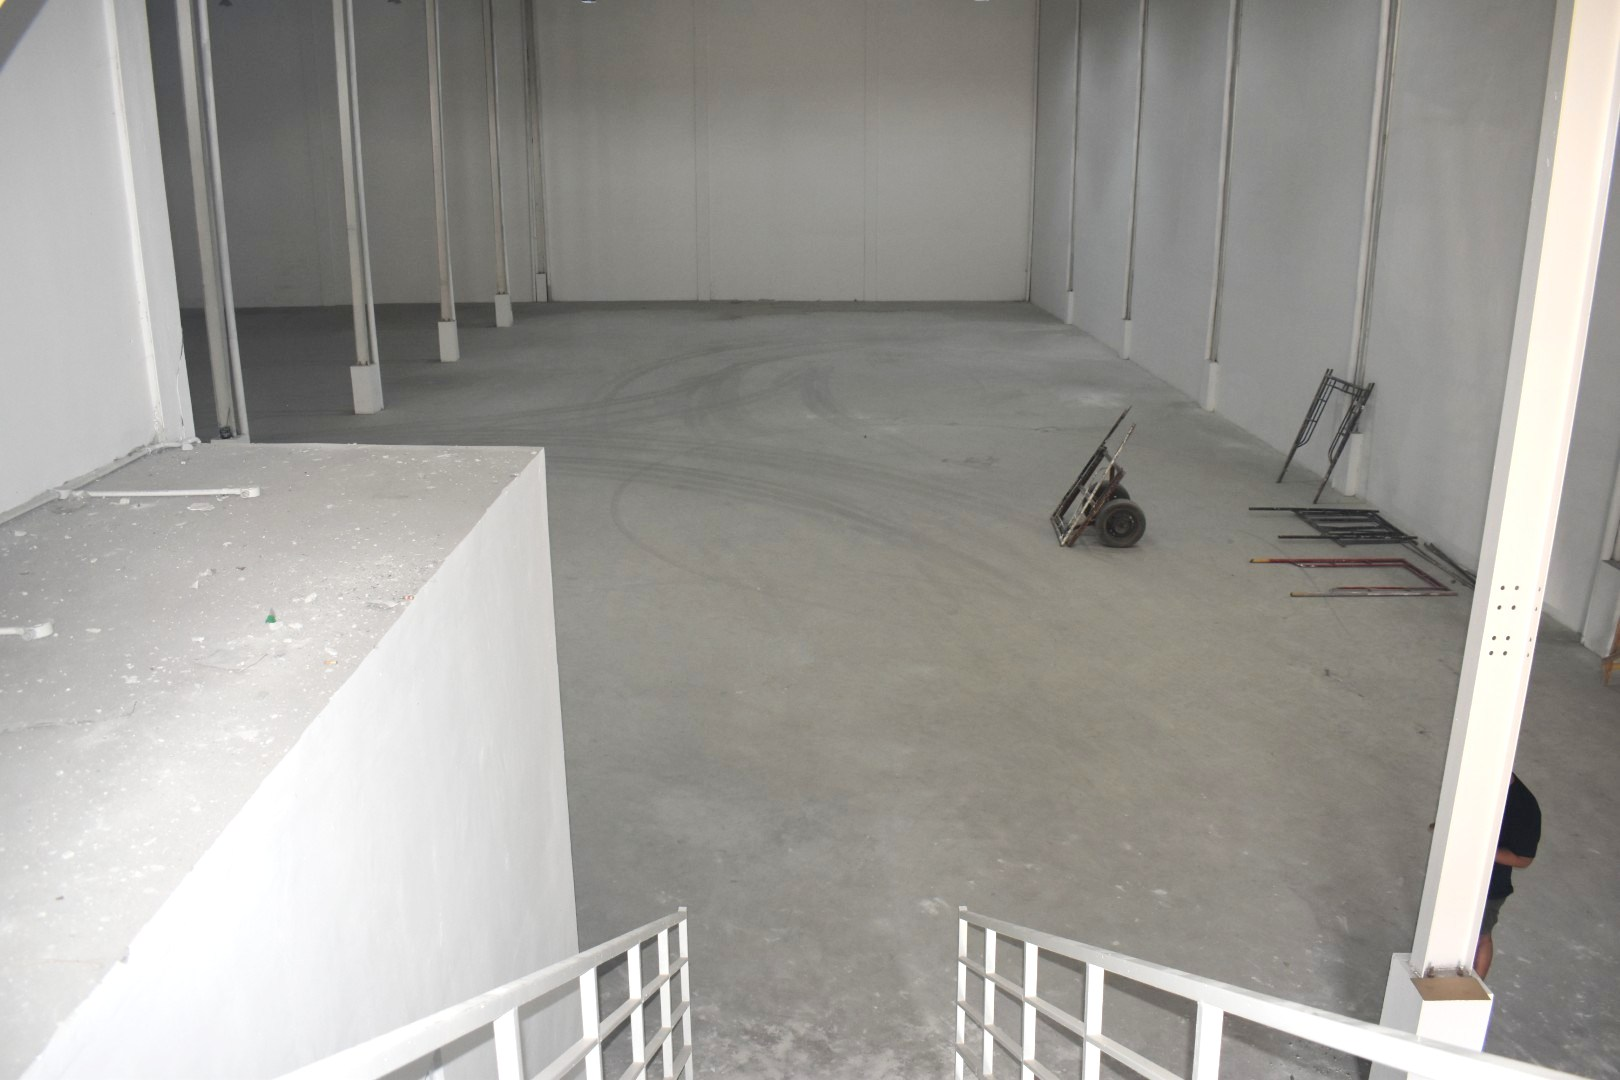 Sewa Gudang Baru Loading Dock Kawasan Industri Delta Silicon Cikarang - 8